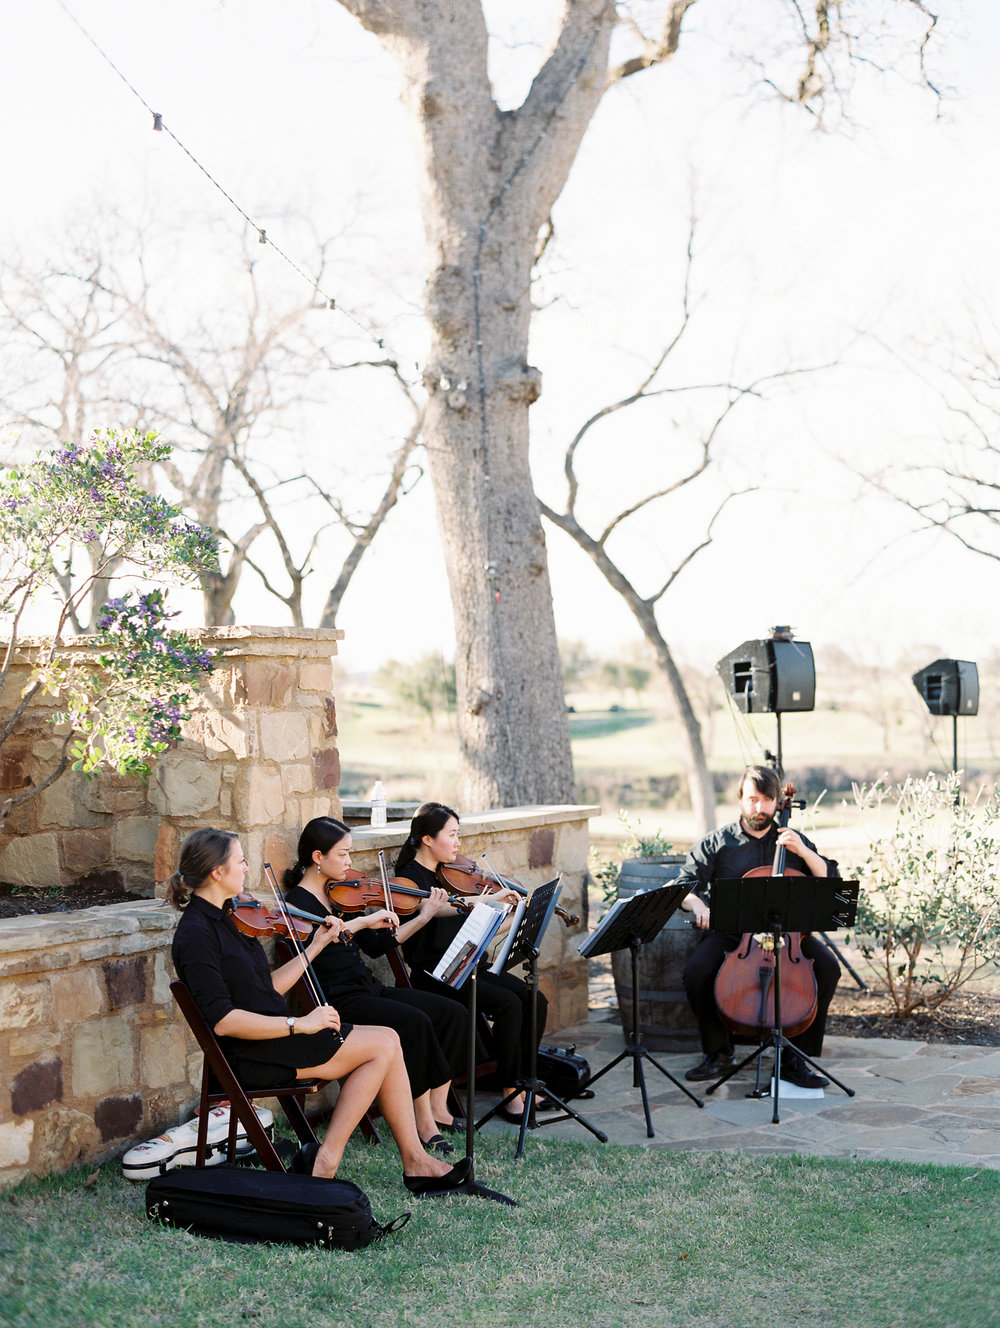 Escondido-Golf_Lake-Club-Hill-Country-Houston-Wedding-Photographer-Best-Top-Luxury-Destination-Engagements-Portrait-Austin-Photography-81.jpg